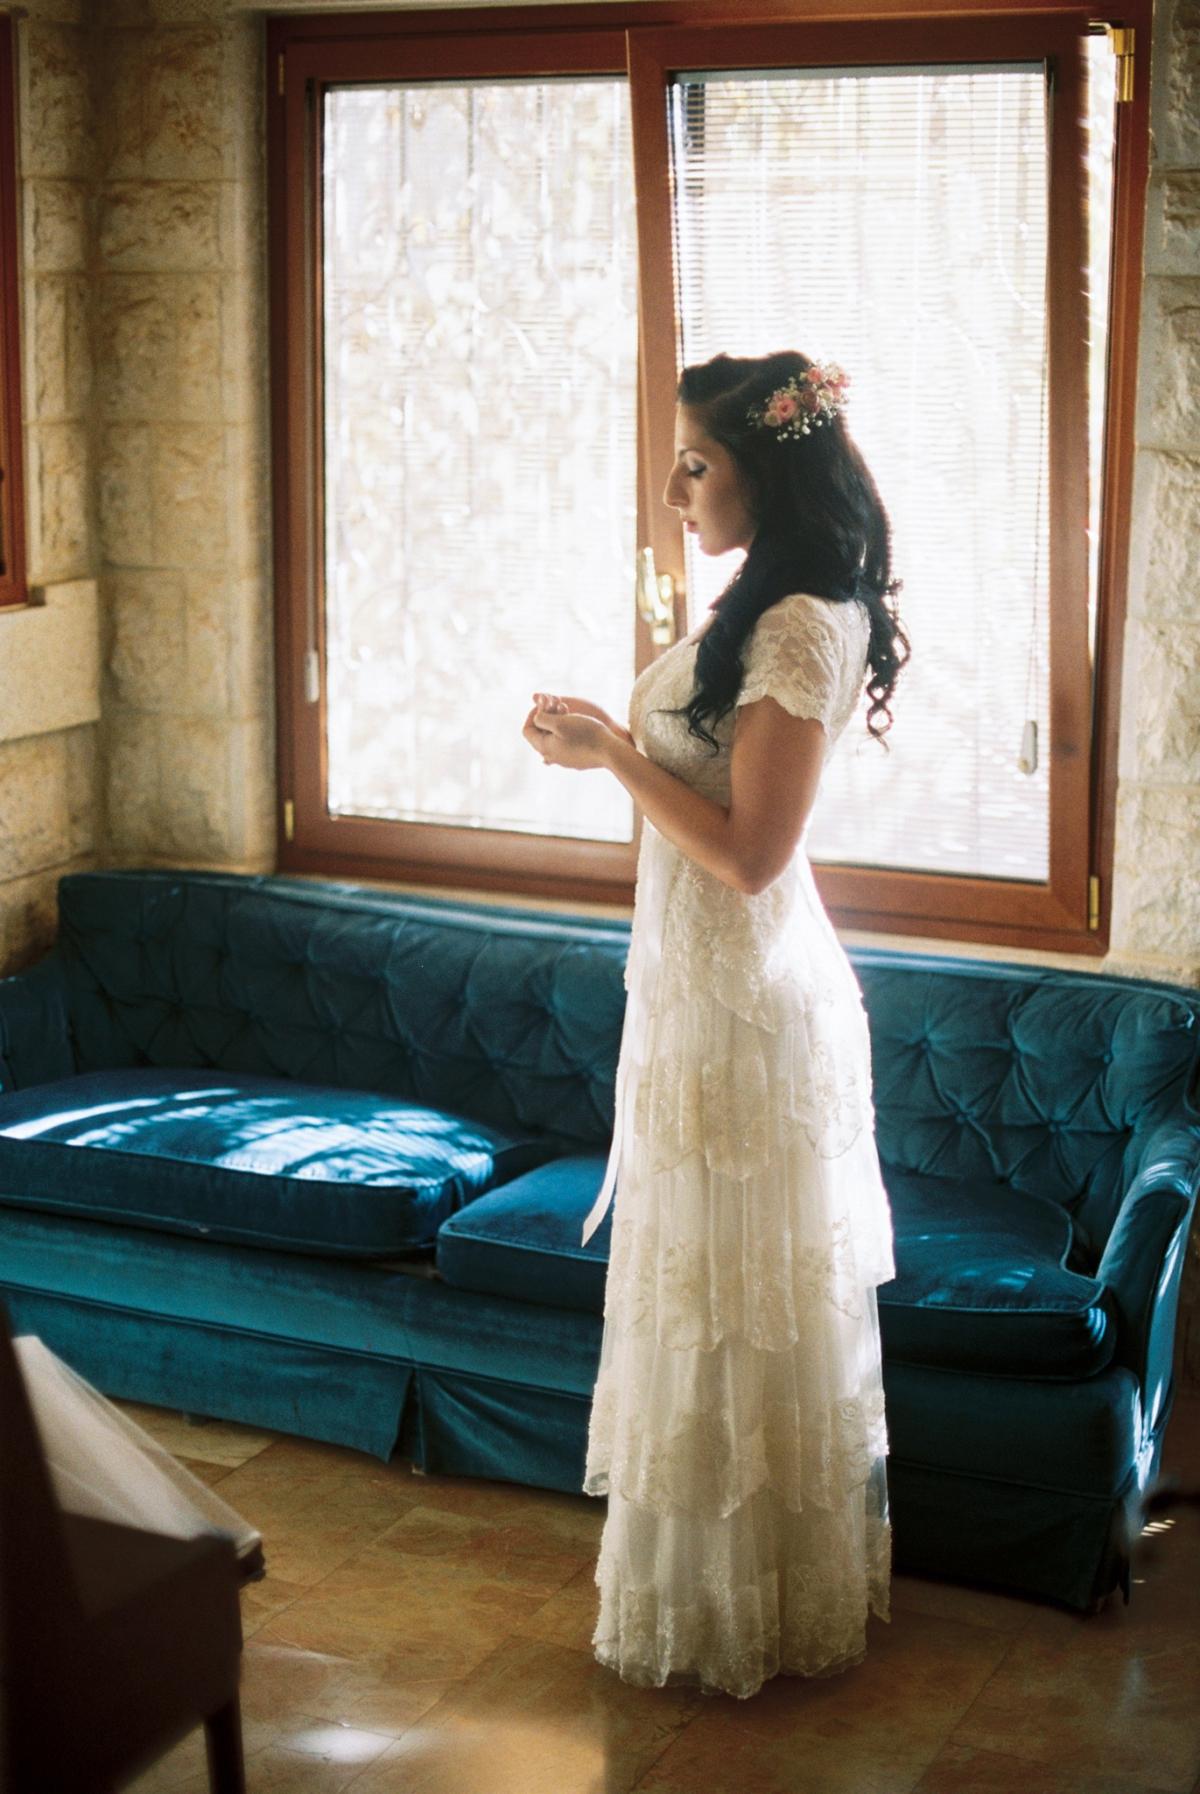 neot-kedumim-wedding-israel-shira-and-eilam-sigala-photography_0016